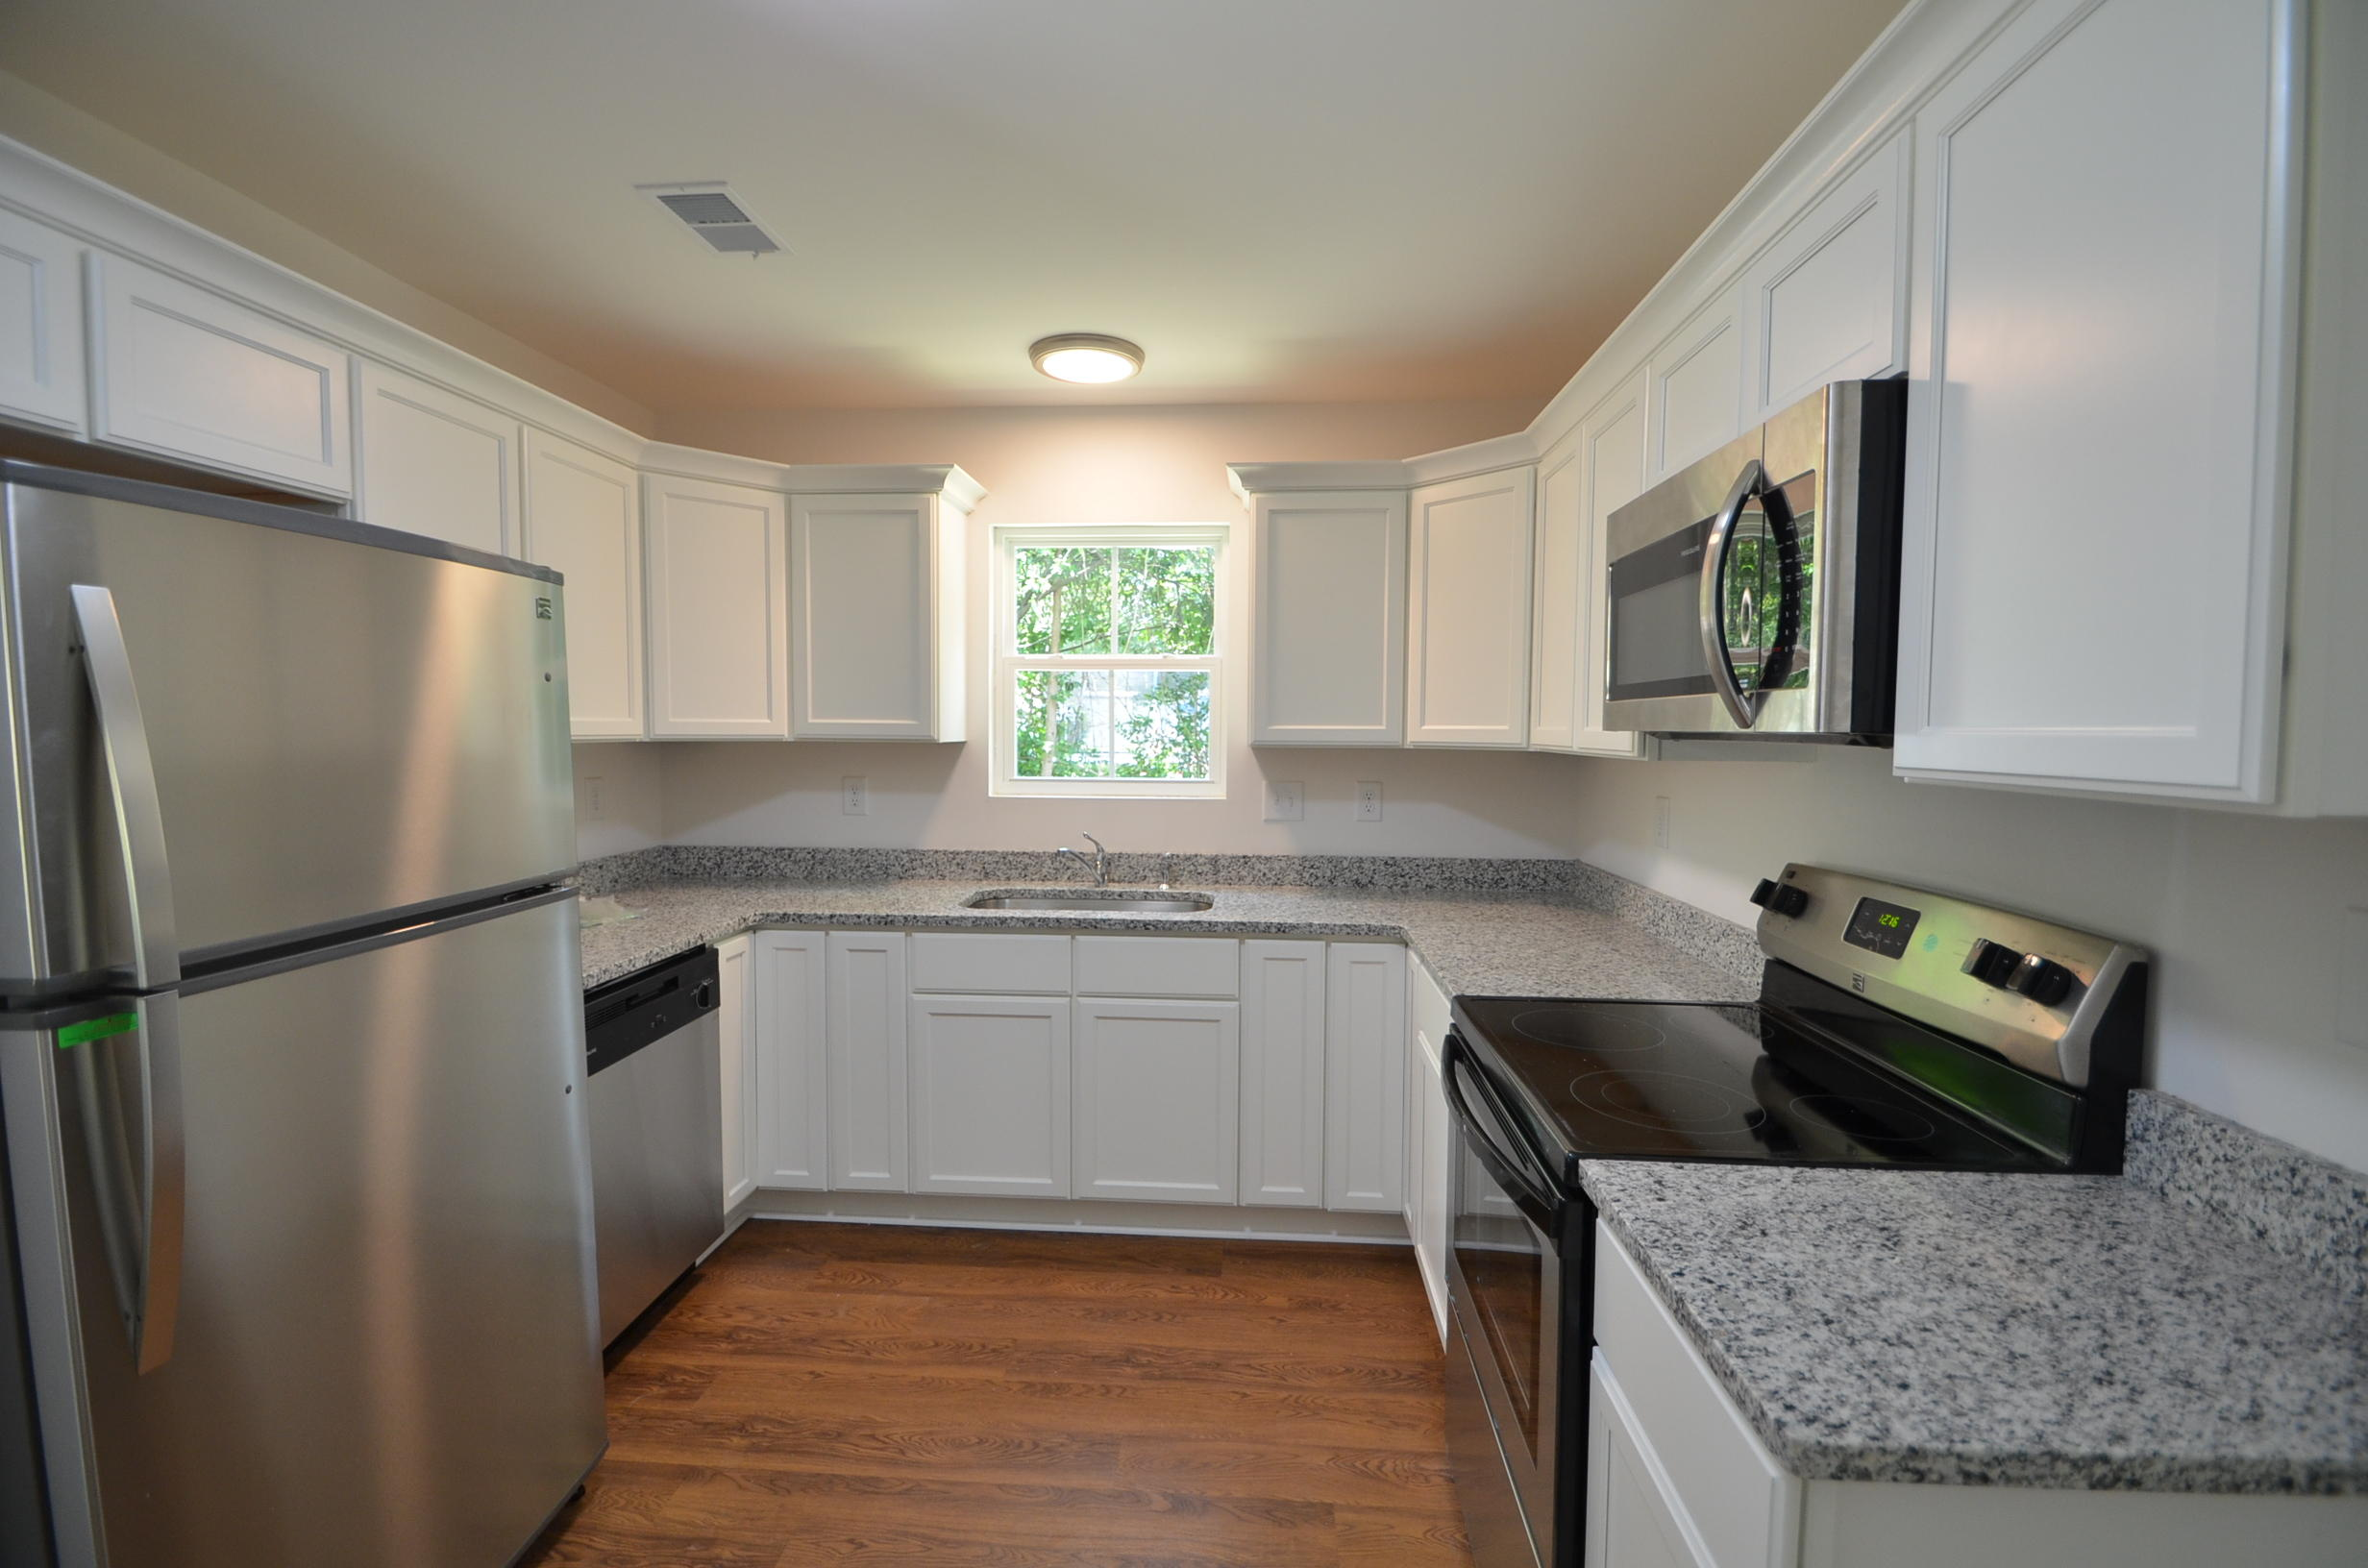 None Homes For Sale - 211 White, Moncks Corner, SC - 4